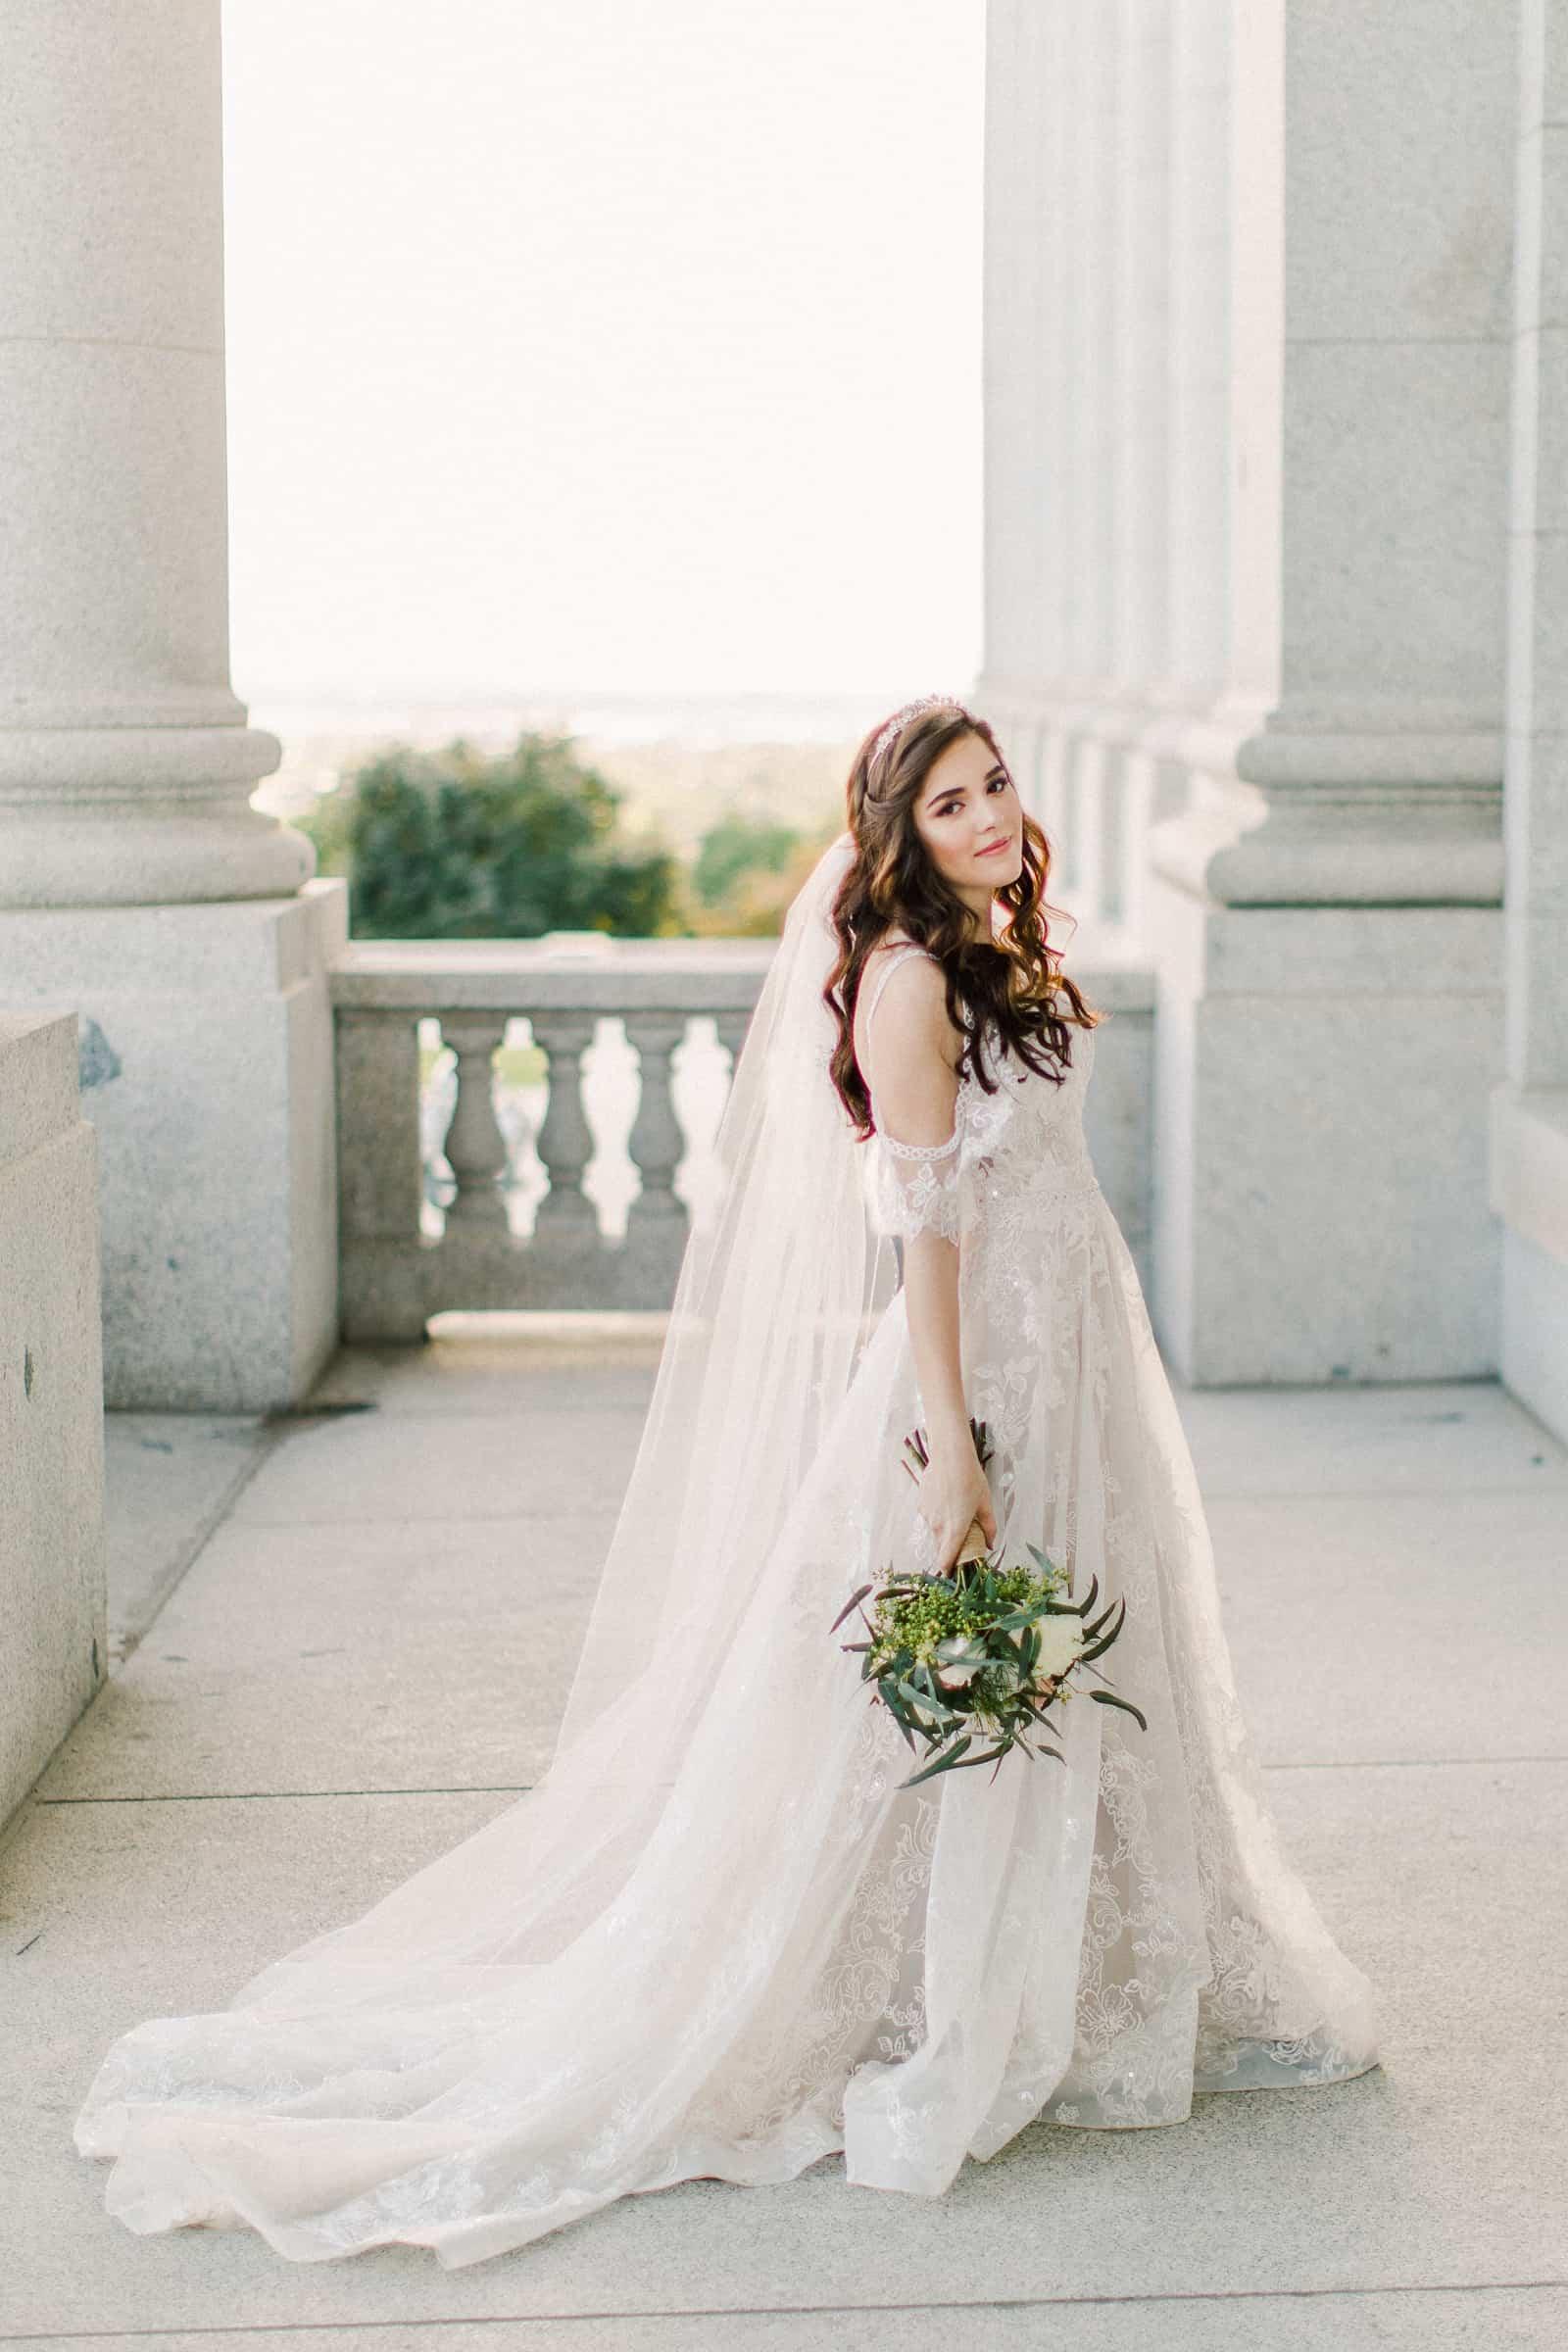 Palestinian Iranian Bride and Groom, Utah Wedding Photography at the Utah State Capitol, beautiful bride boho lace dress